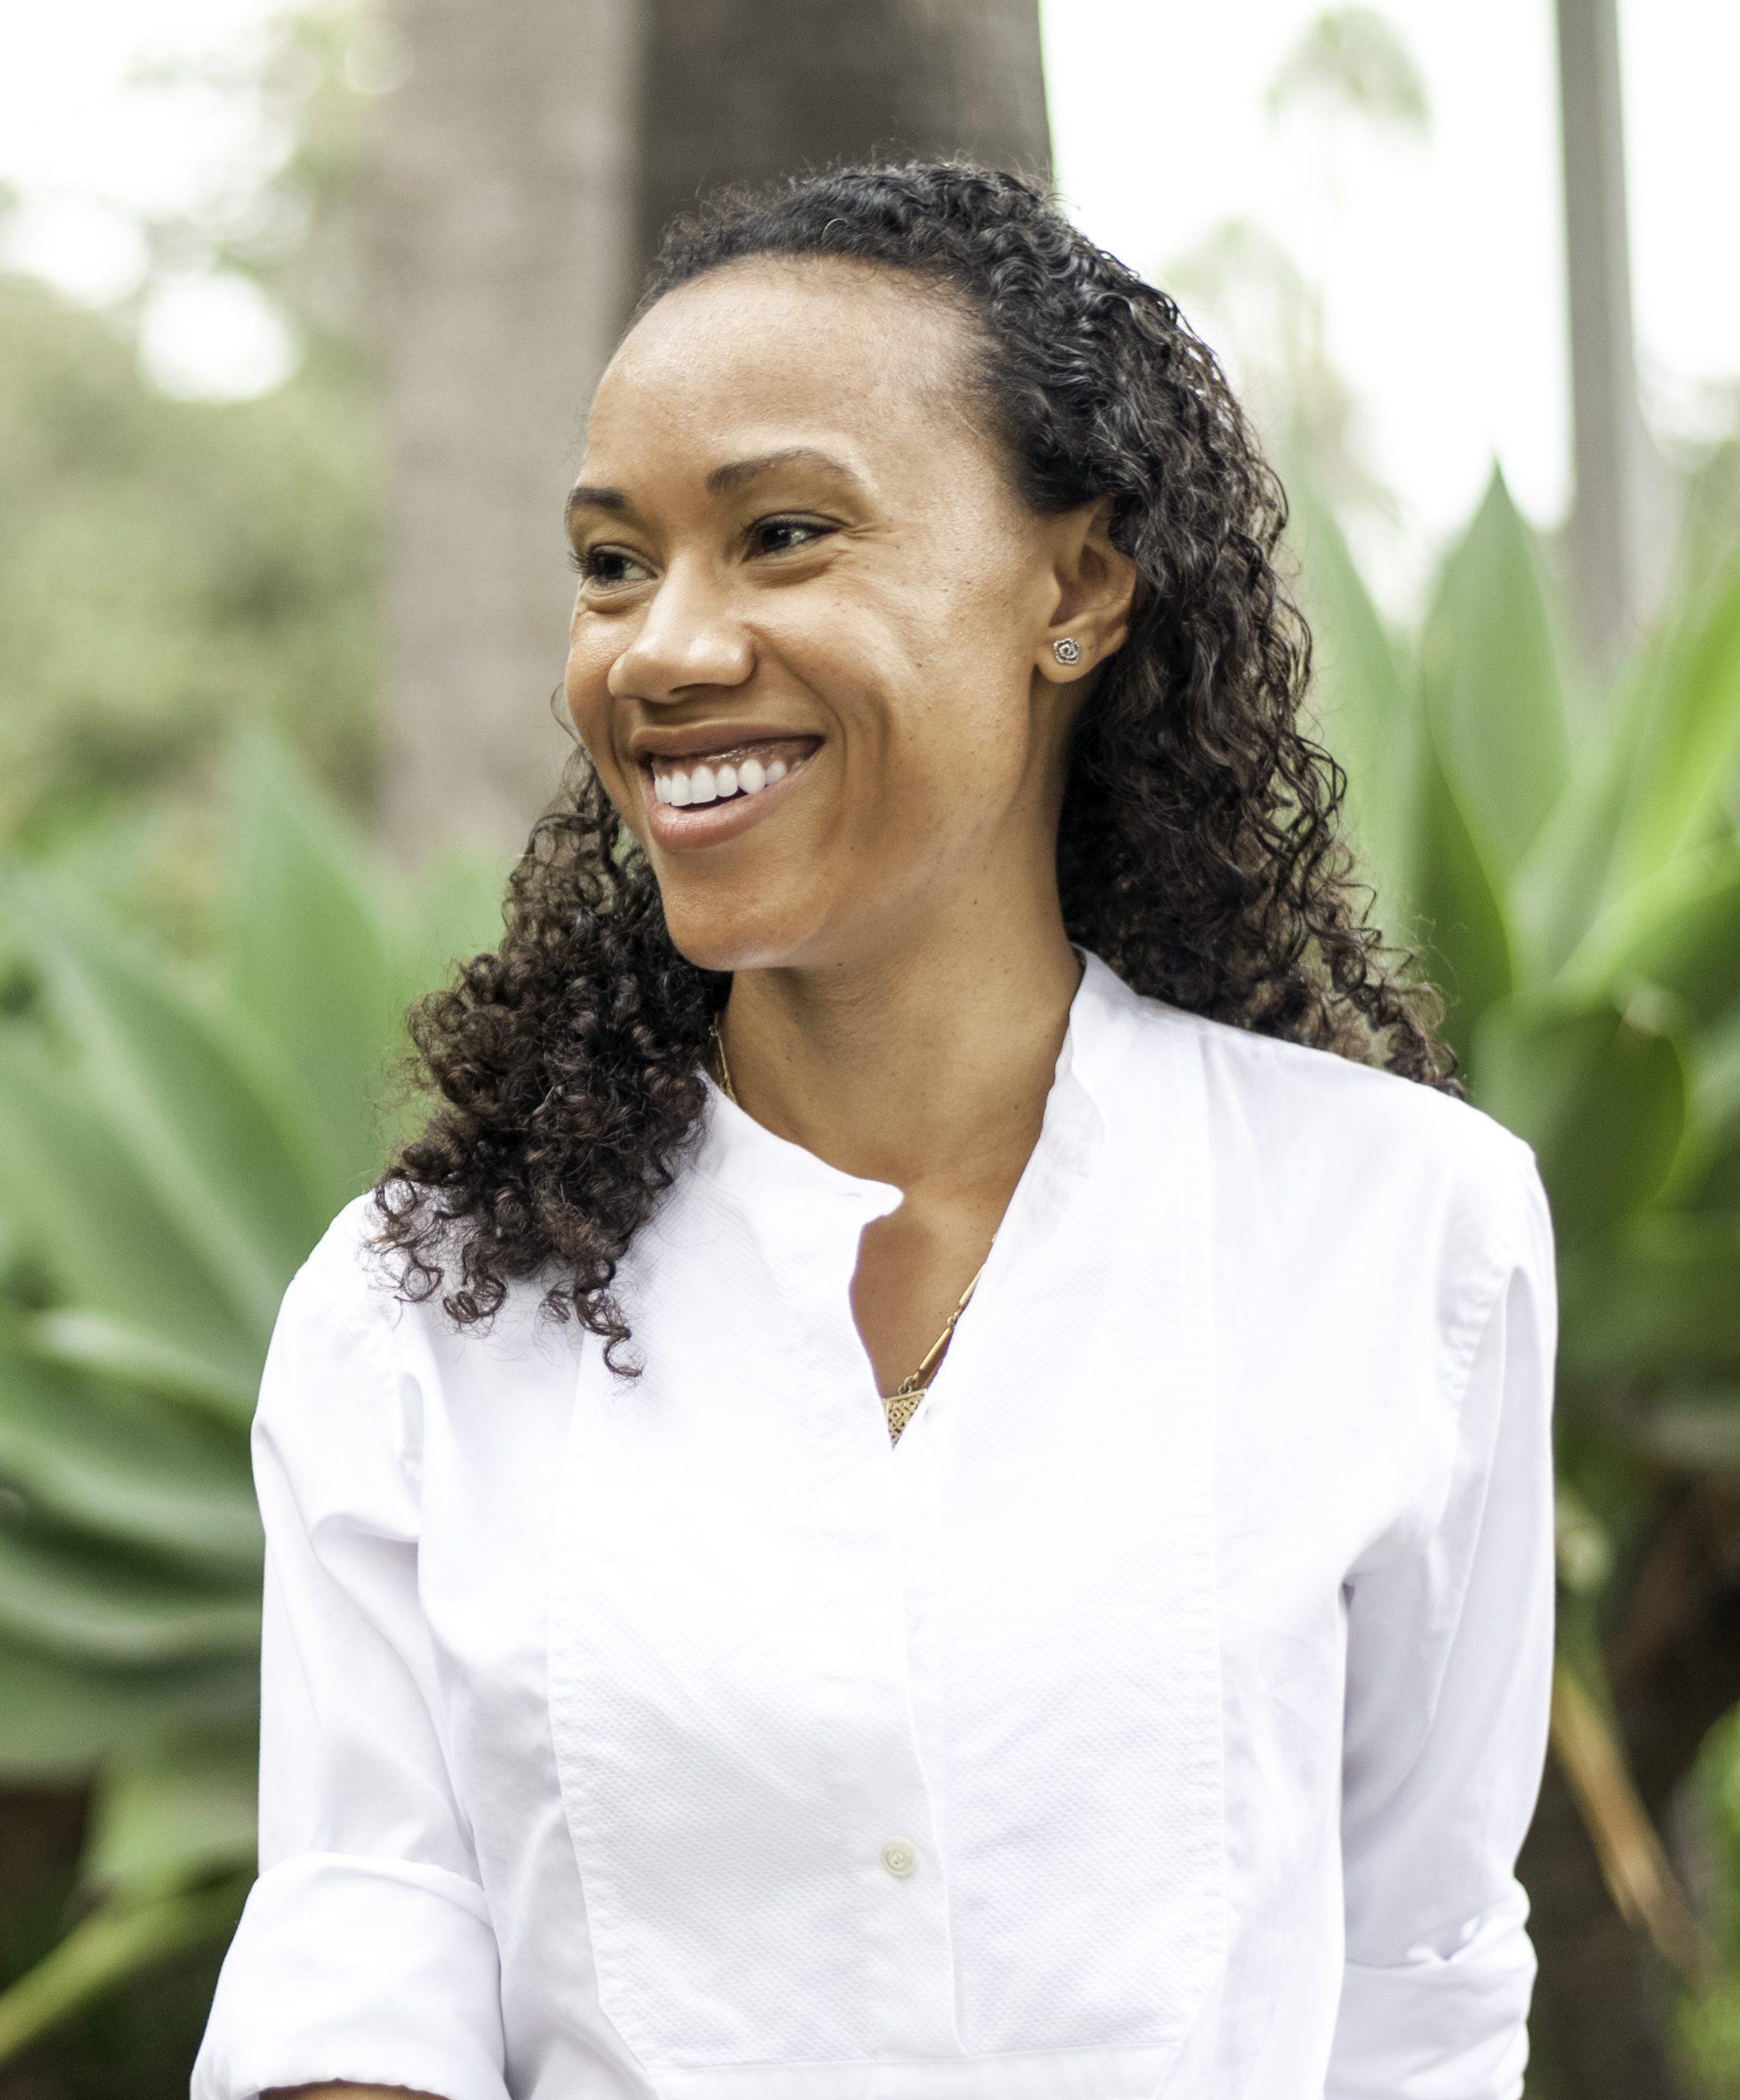 Dr. Christina Ford